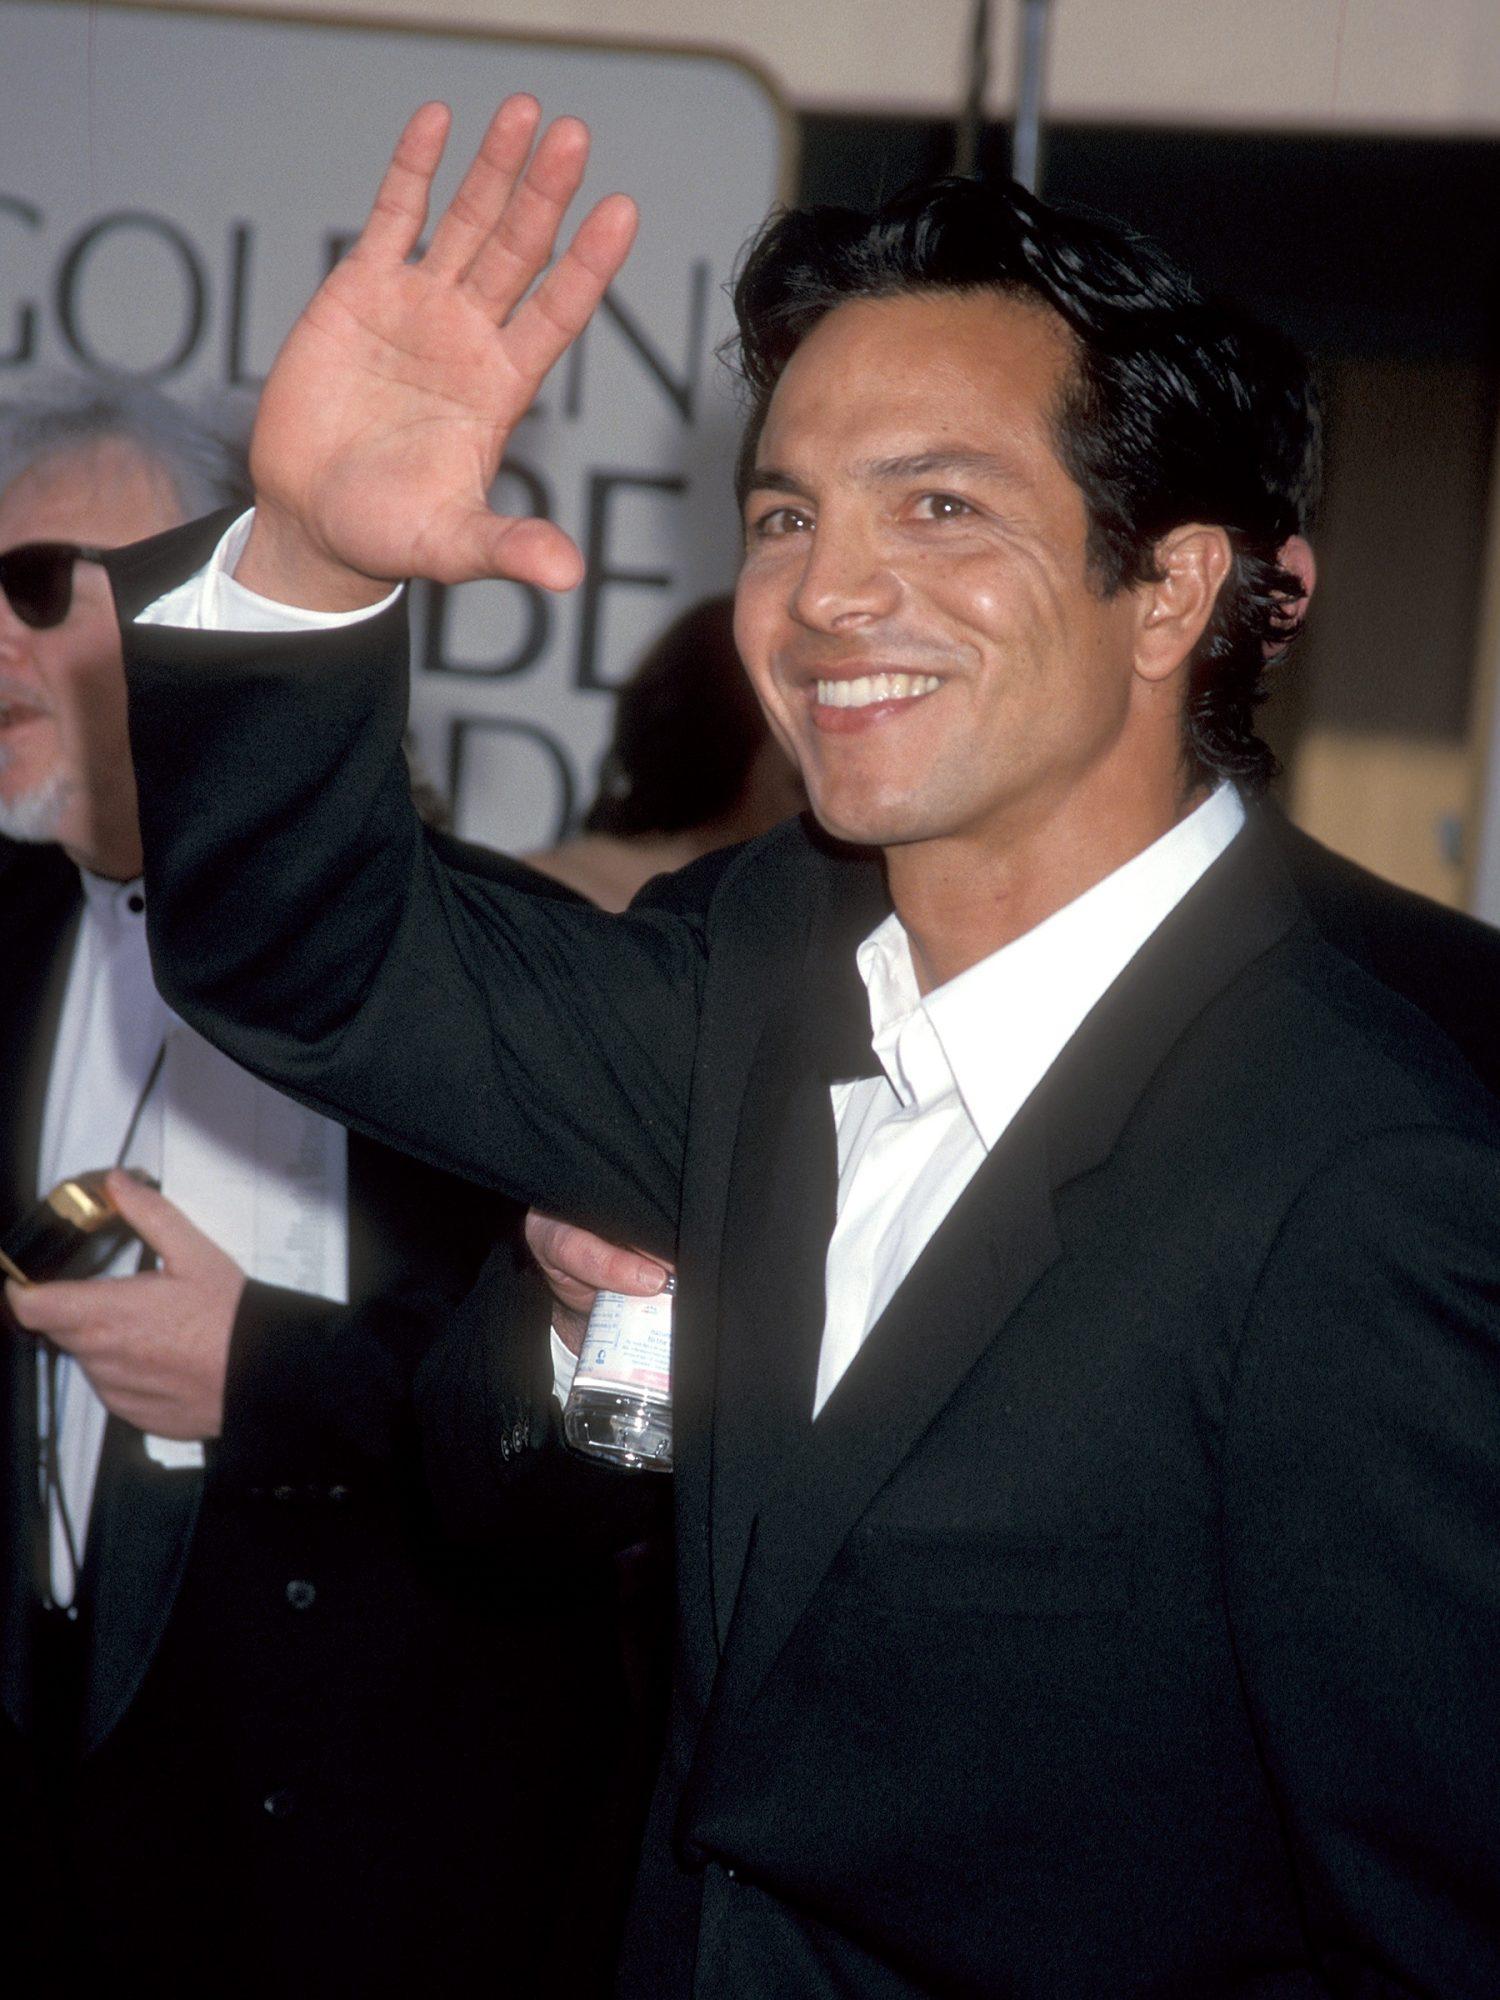 59th Annual Golden Globe Awards - Arrivals